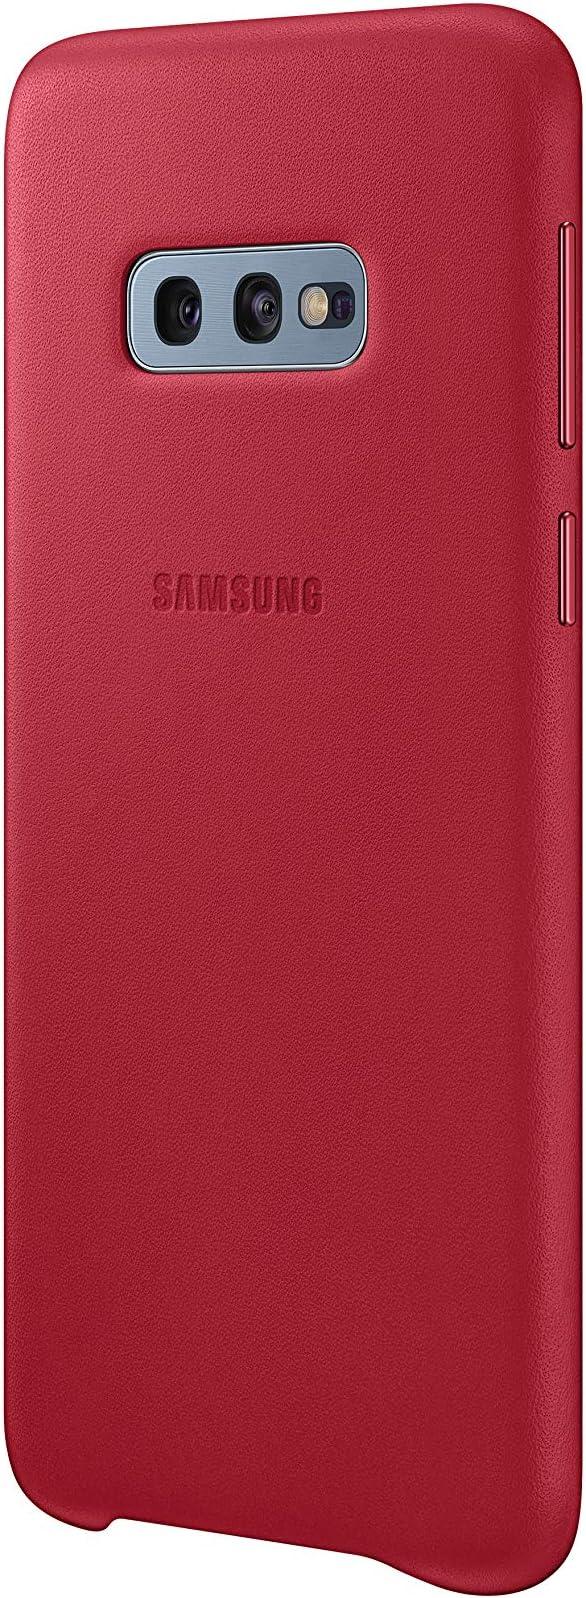 Leather Cover Für Galaxy S10 Rot Elektronik